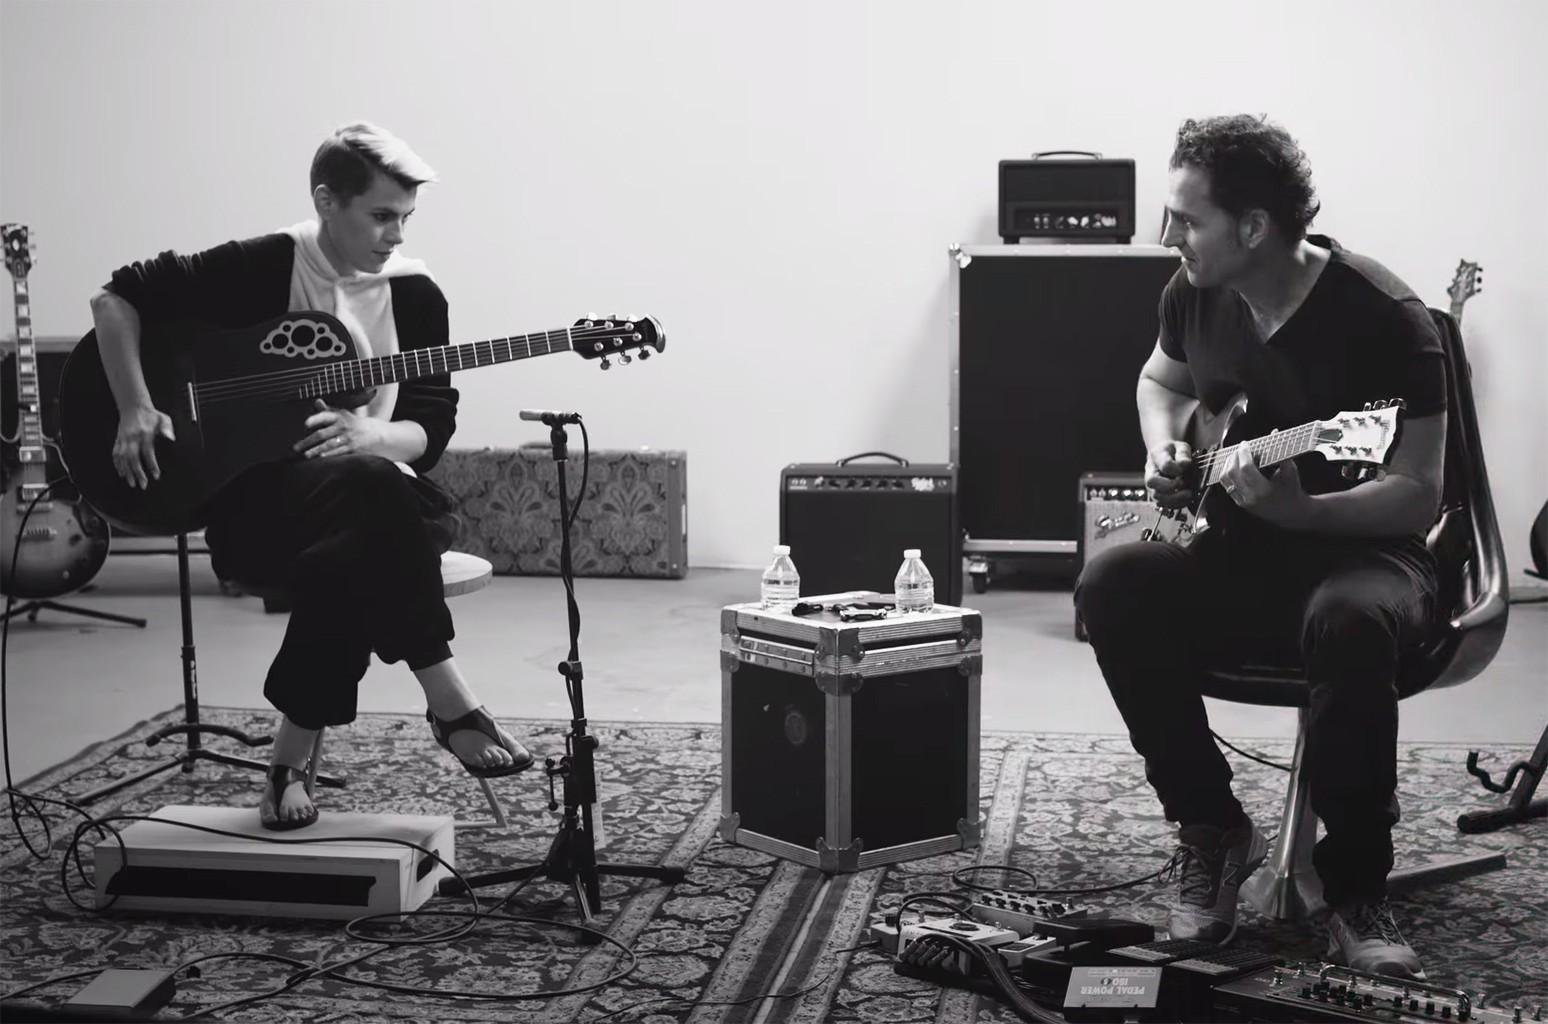 Guitar Power - Season 5 Trailer